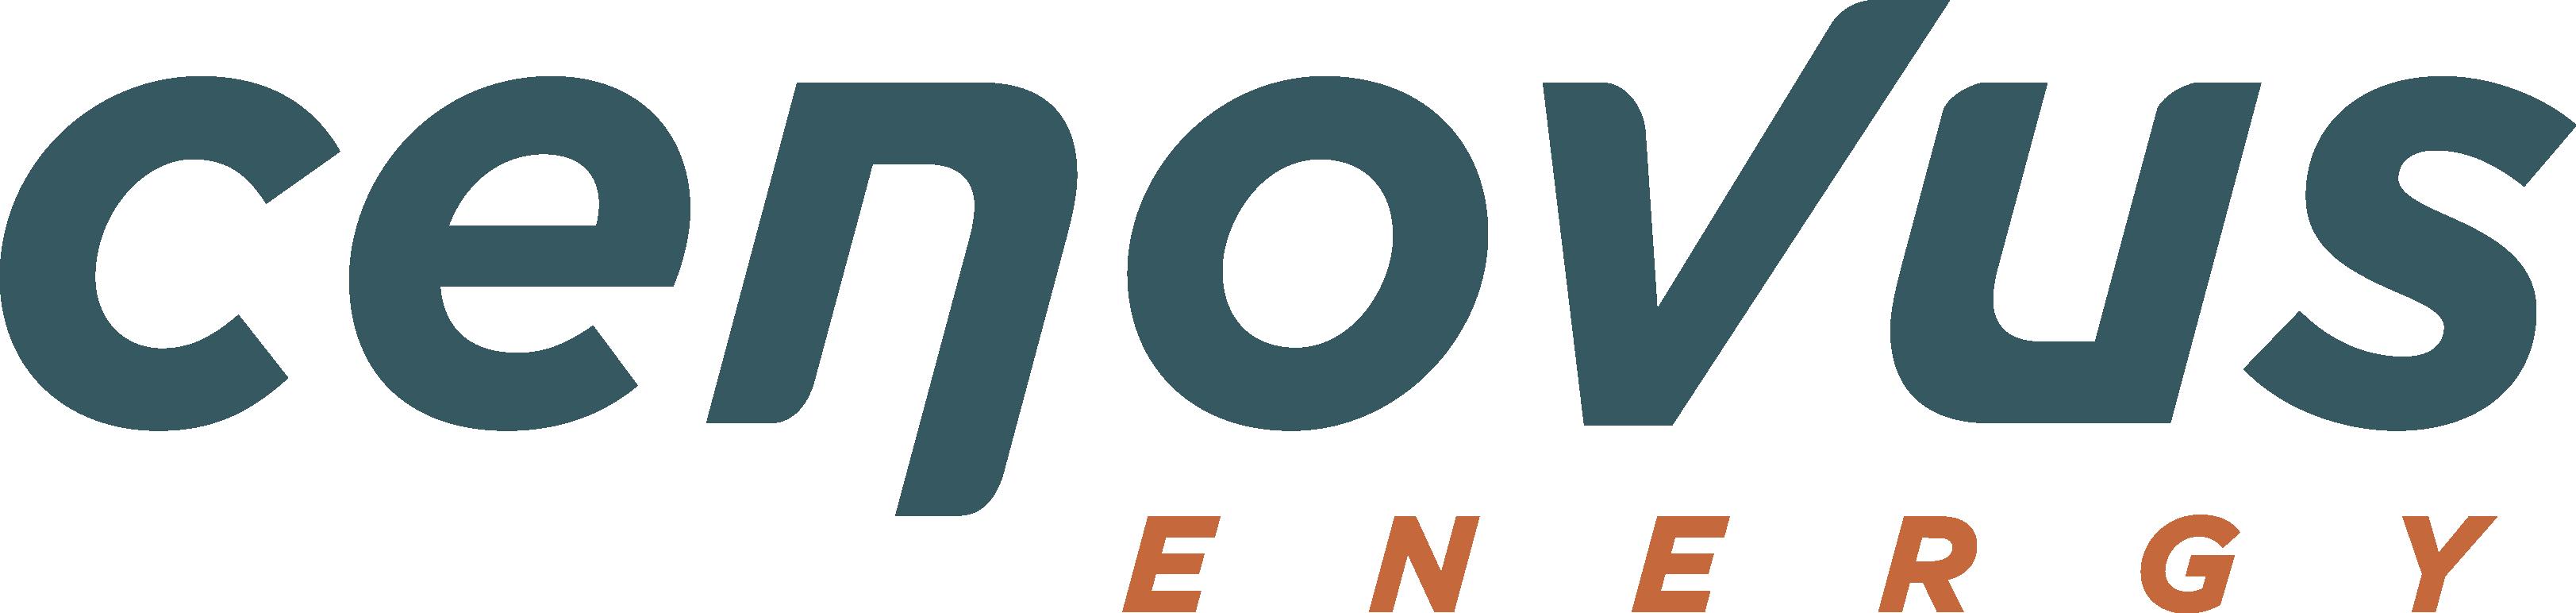 Cenovus Energy (anciennement Husky Energy, Inc.)